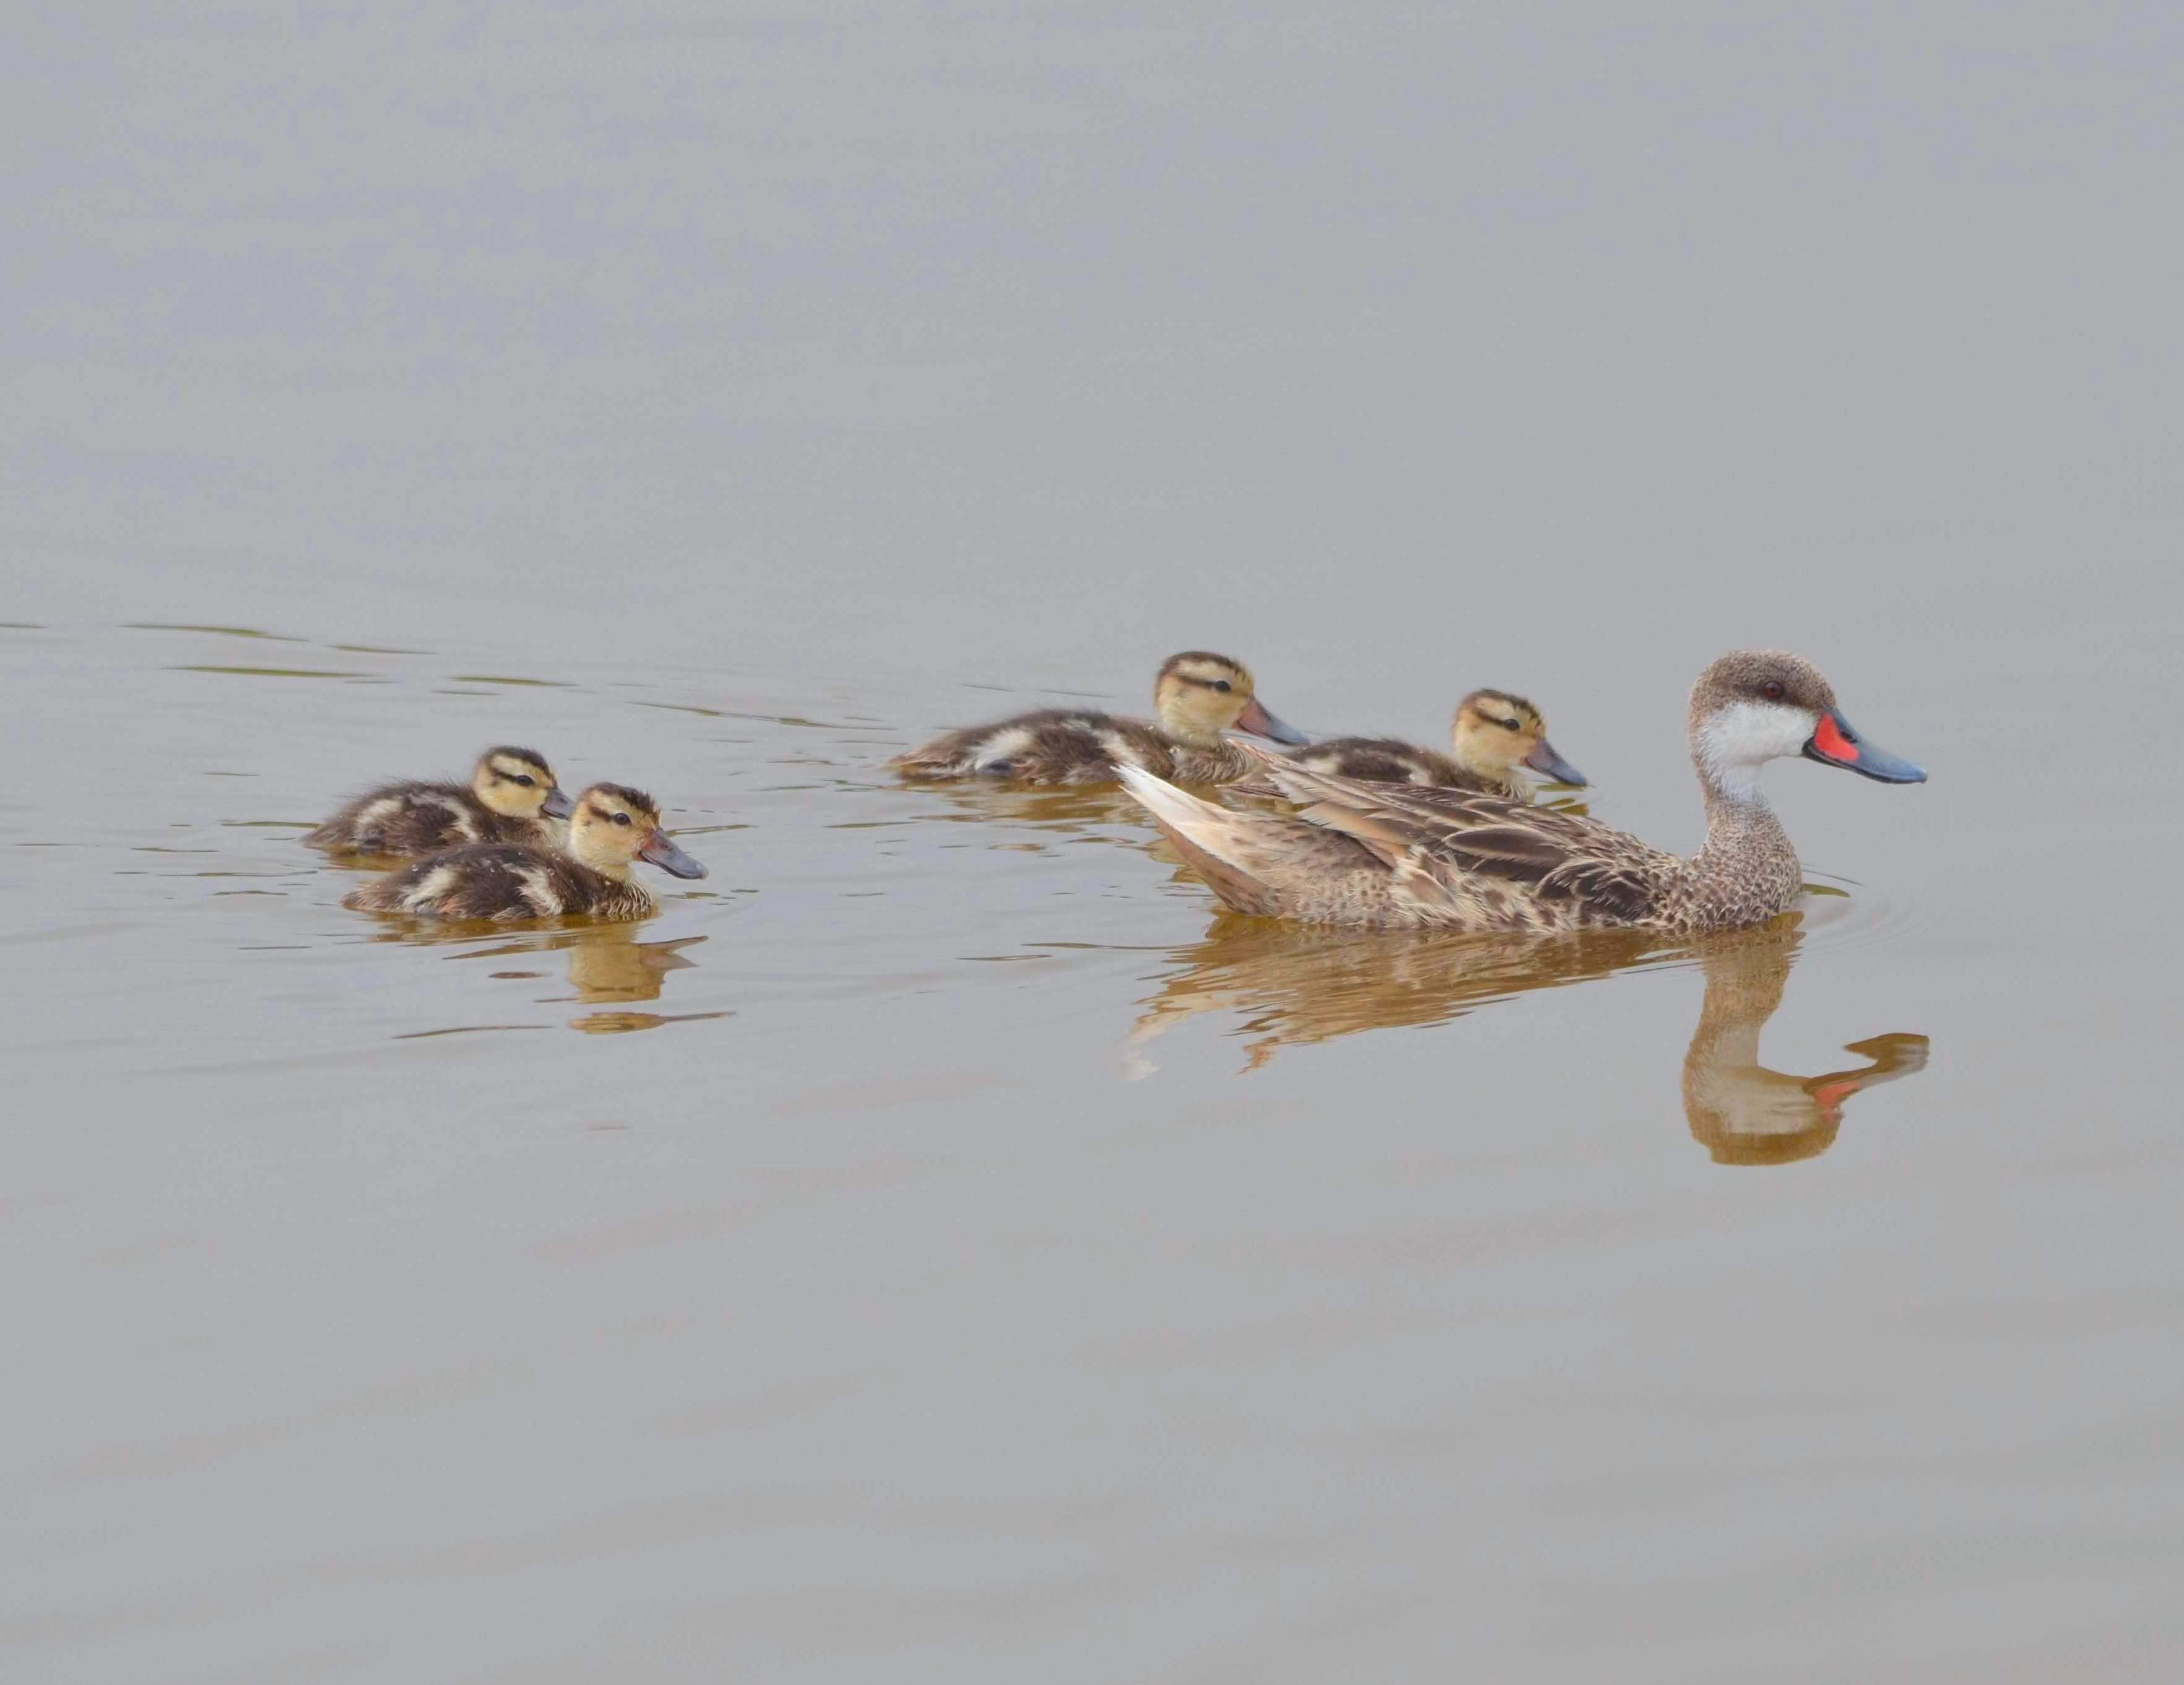 White-Cheeked Pintail Ducks & Bahama Ducklings on Abaco (Charles Skinner)